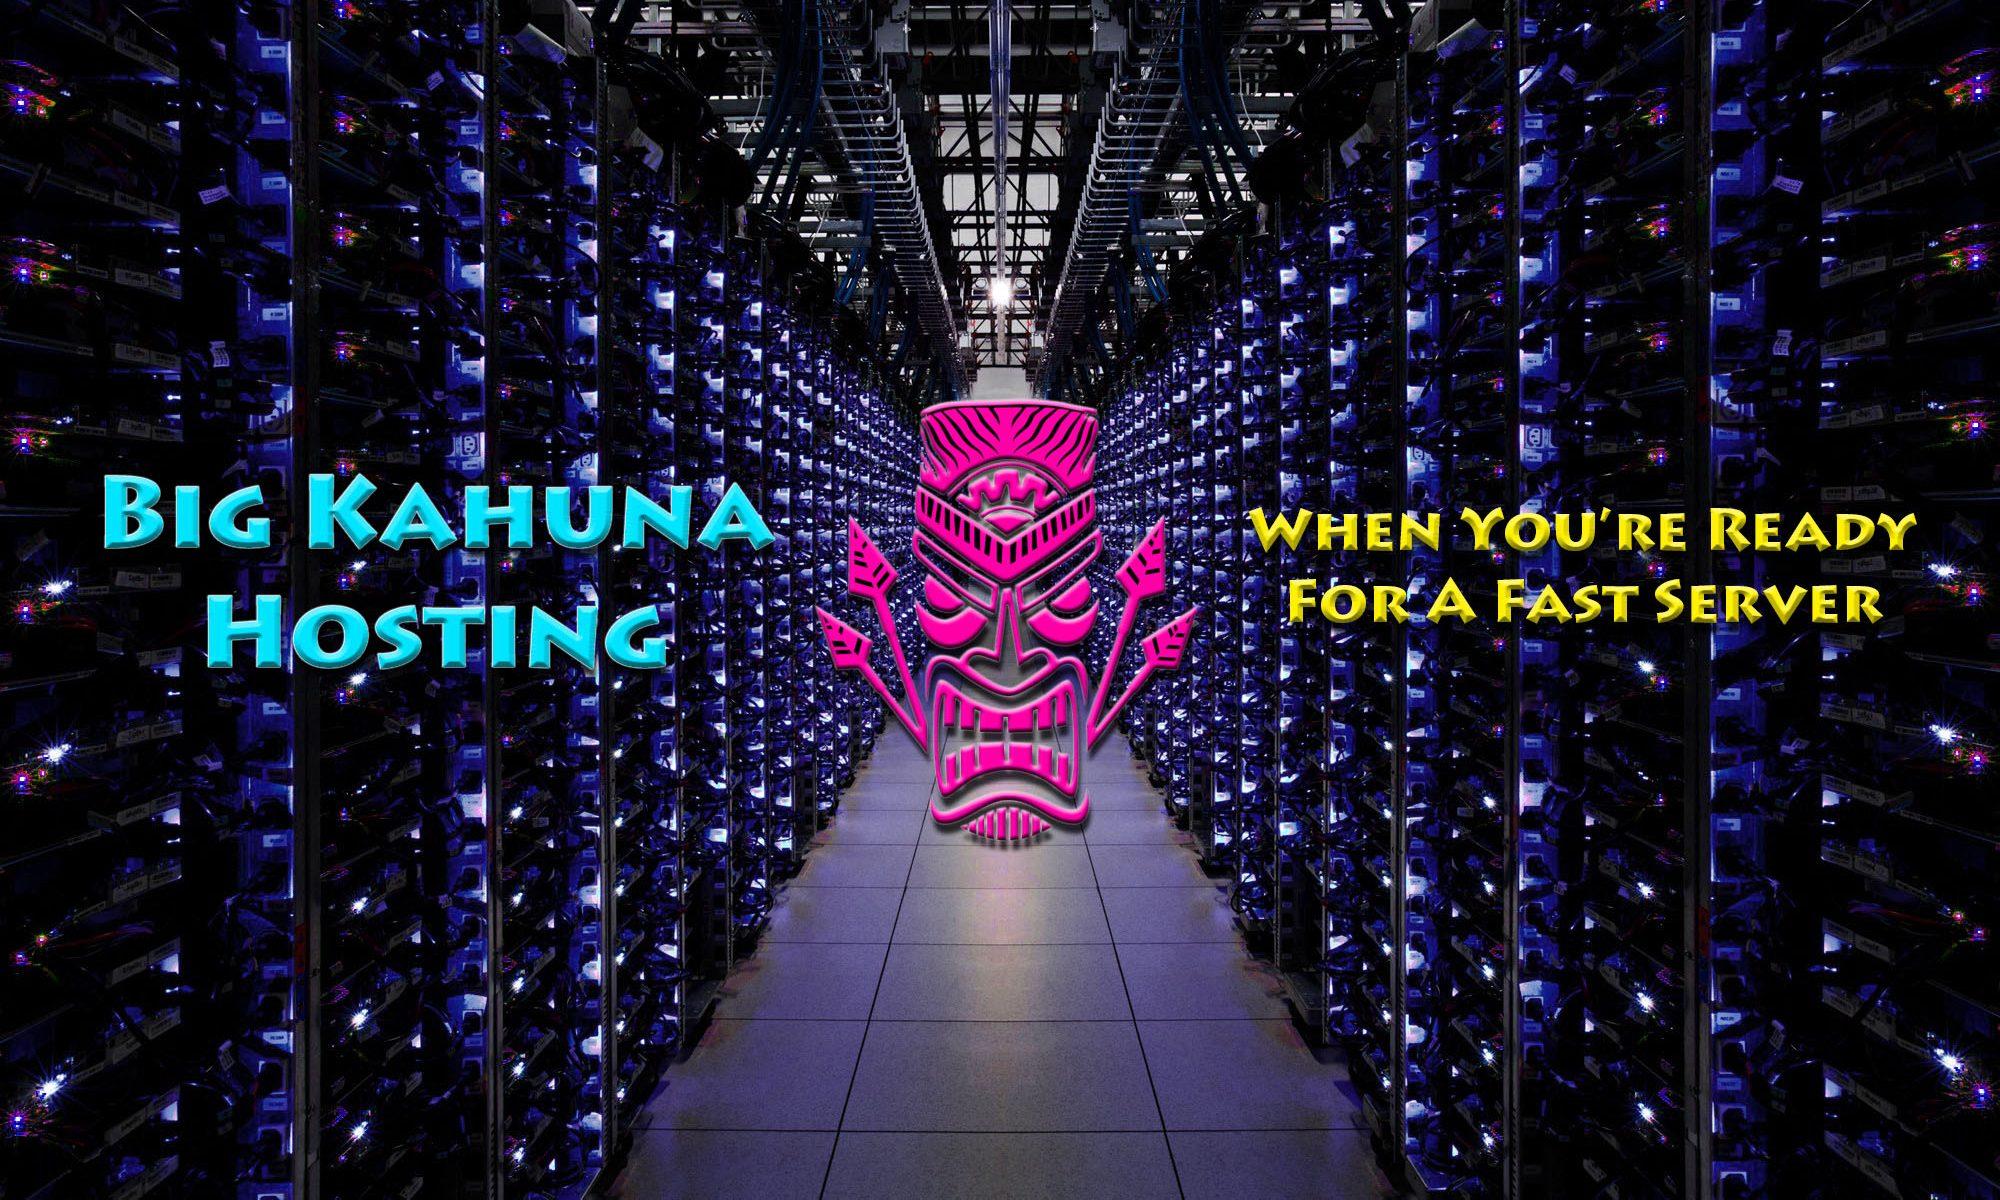 Big Kahuna Hosting